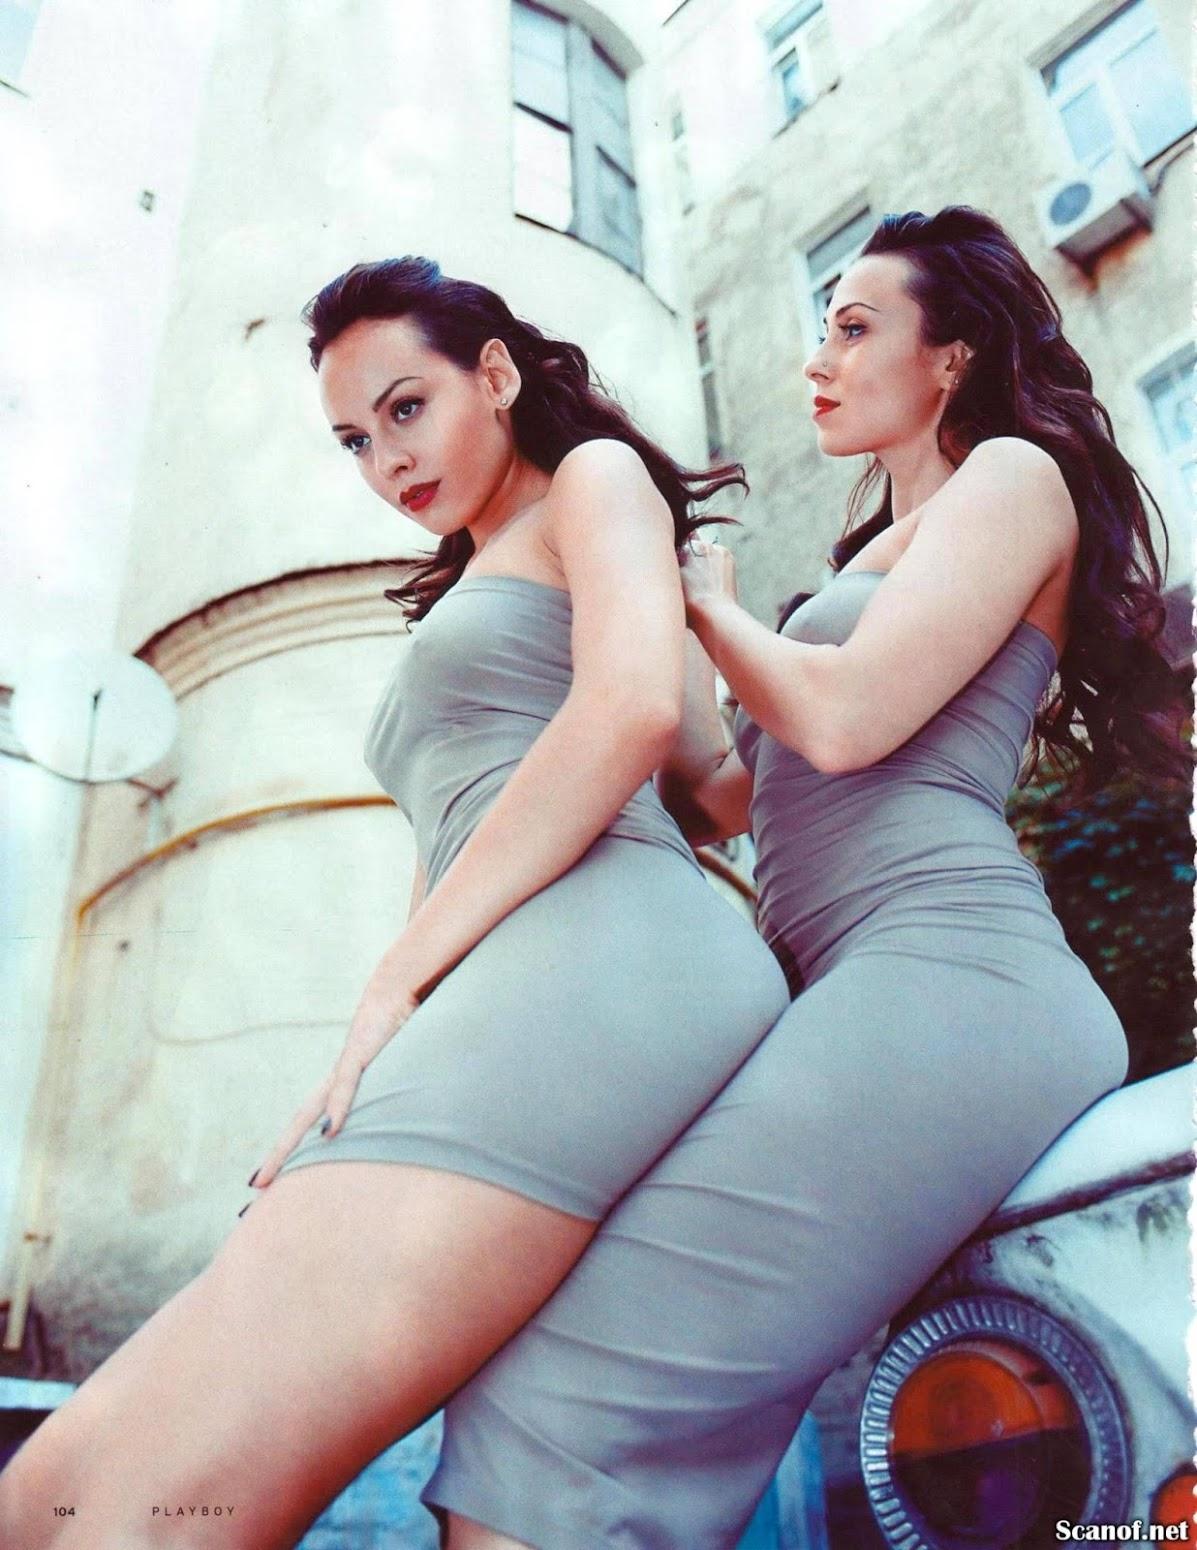 http://4.bp.blogspot.com/-xNHbajklg10/UjnacLAZokI/AAAAAAAAoh0/ufk1XhAr_AA/s1550/475227335_Playboy_9_2013_Ukraine_Scanof.net_084_123_42lo.jpg